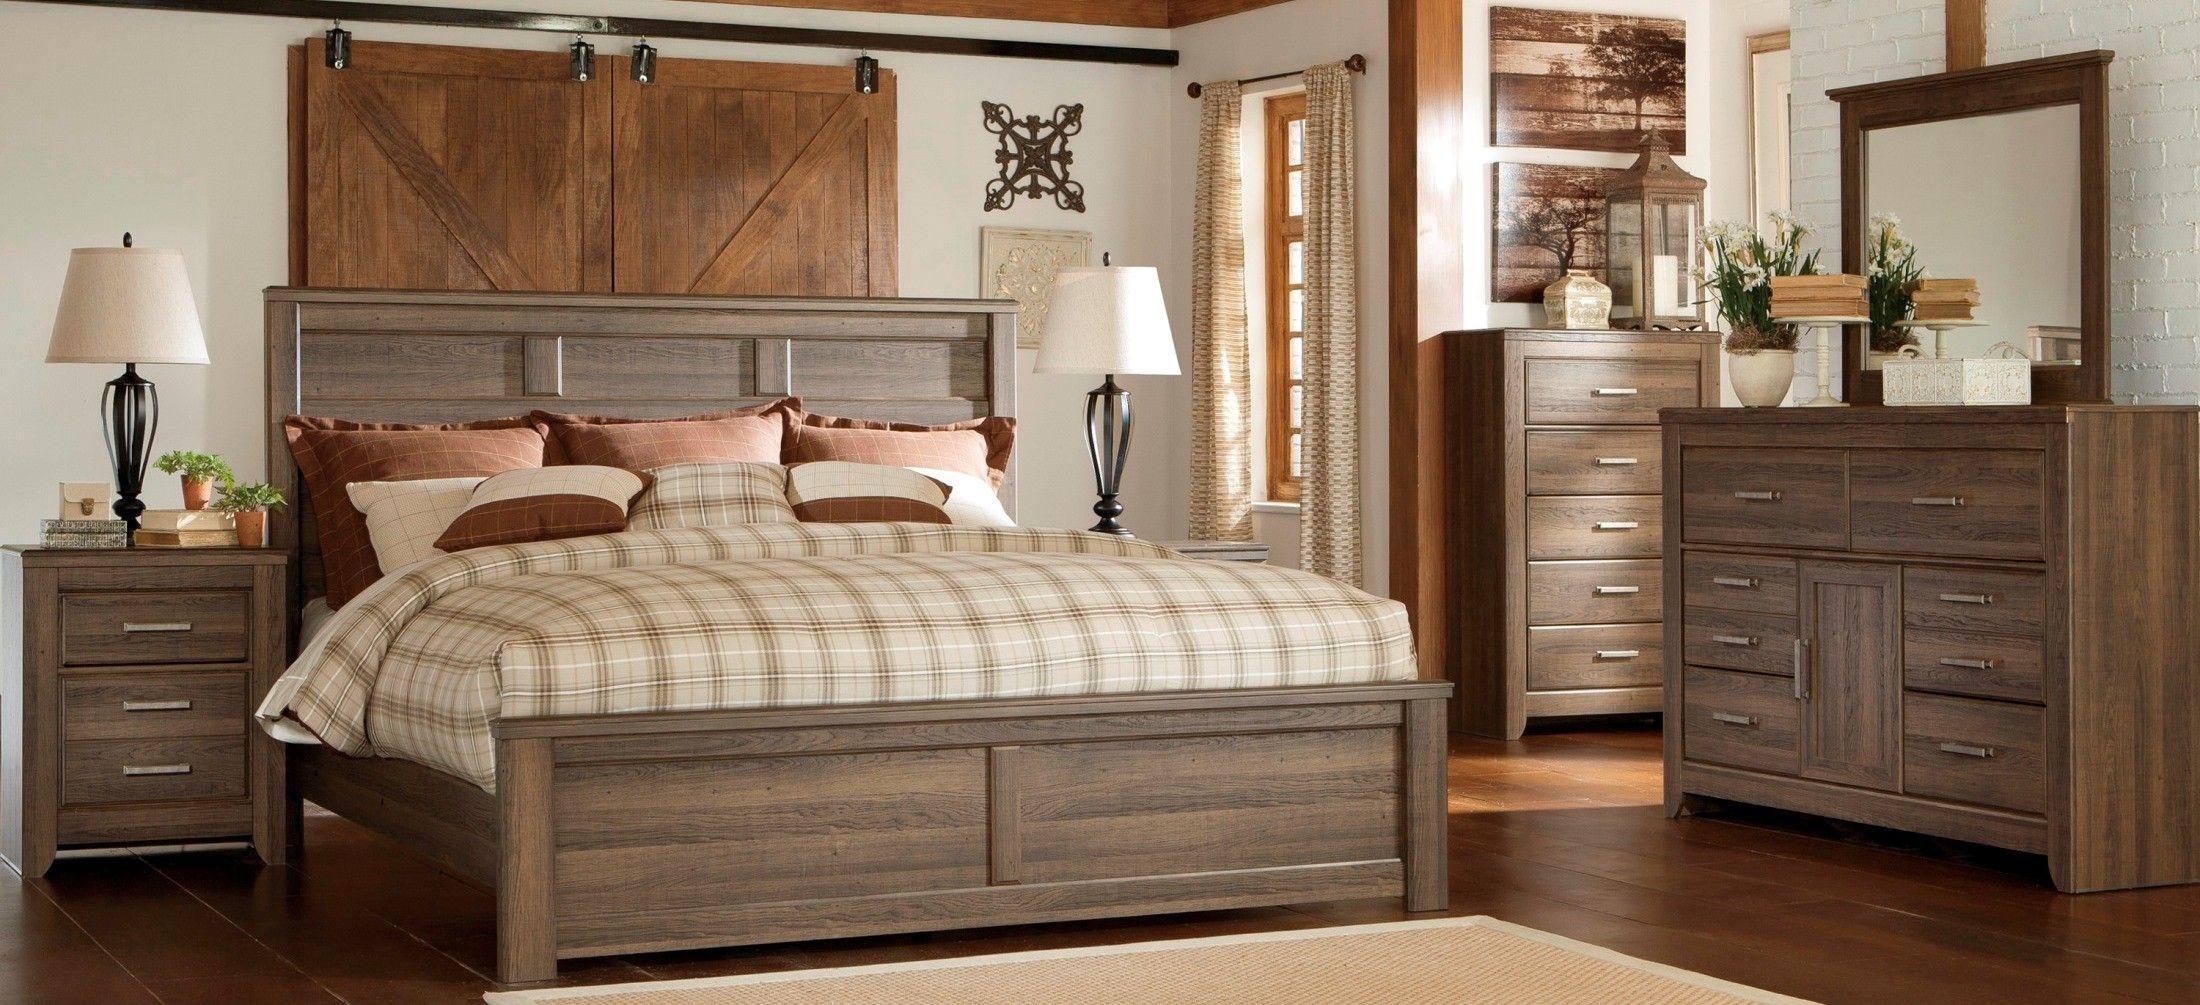 Juararo Dark Brown Panel Bedroom Set in 2020 King size